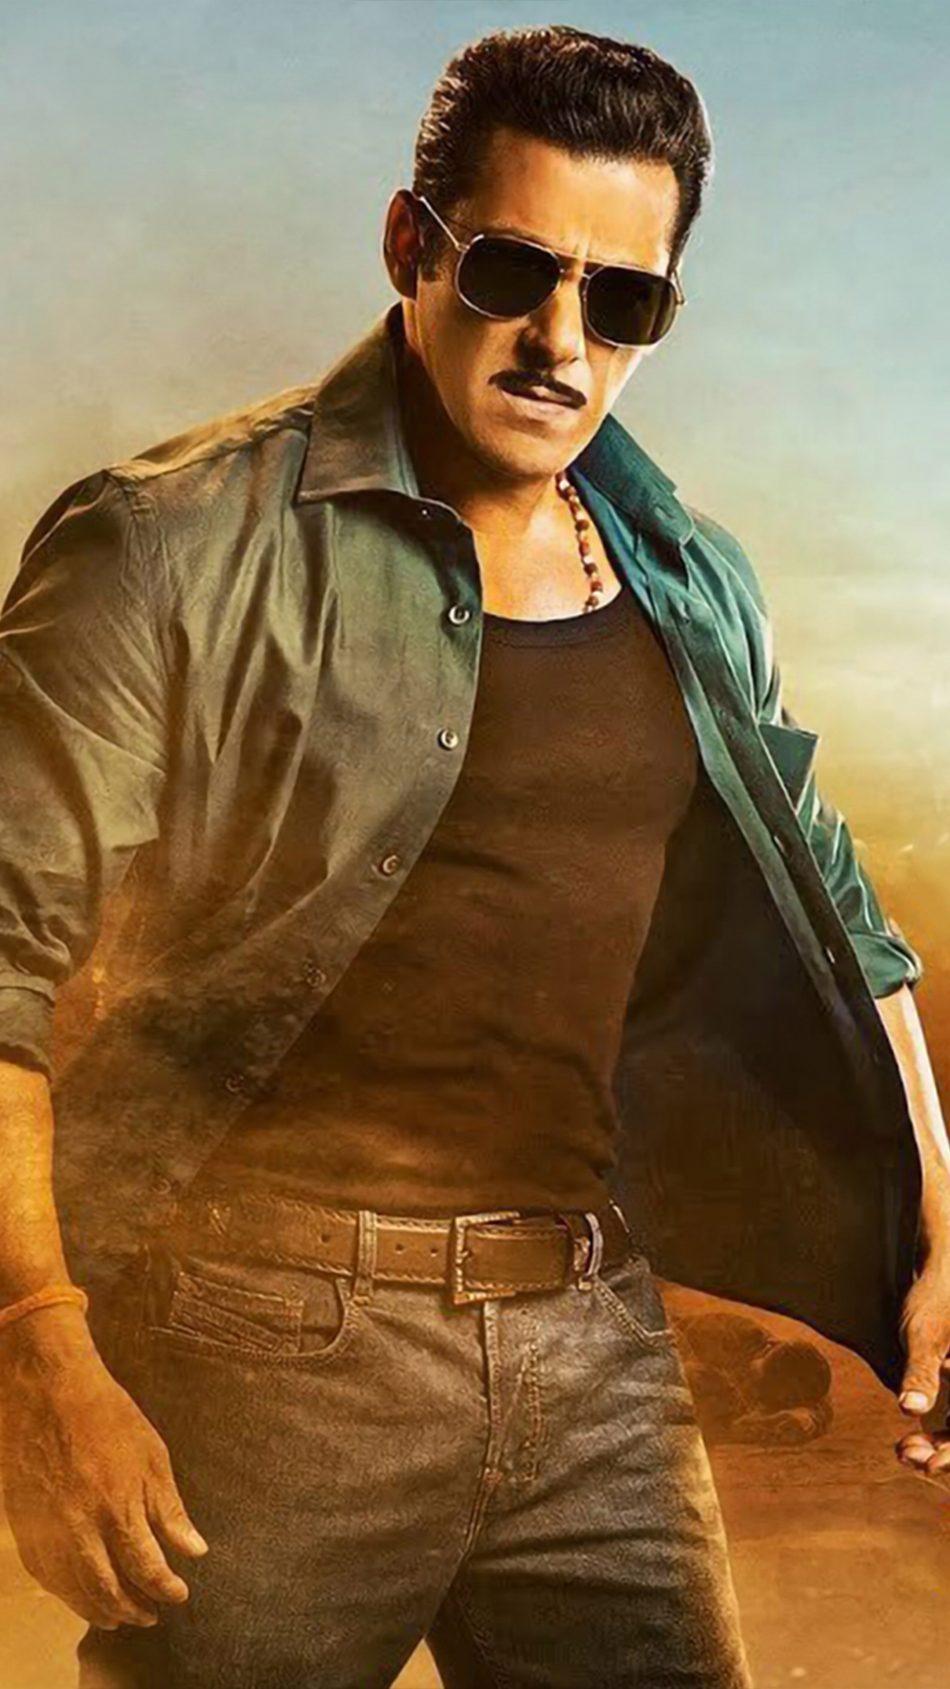 Salman Khan In Dabangg 3 4K Ultra HD Mobile Wallpaper